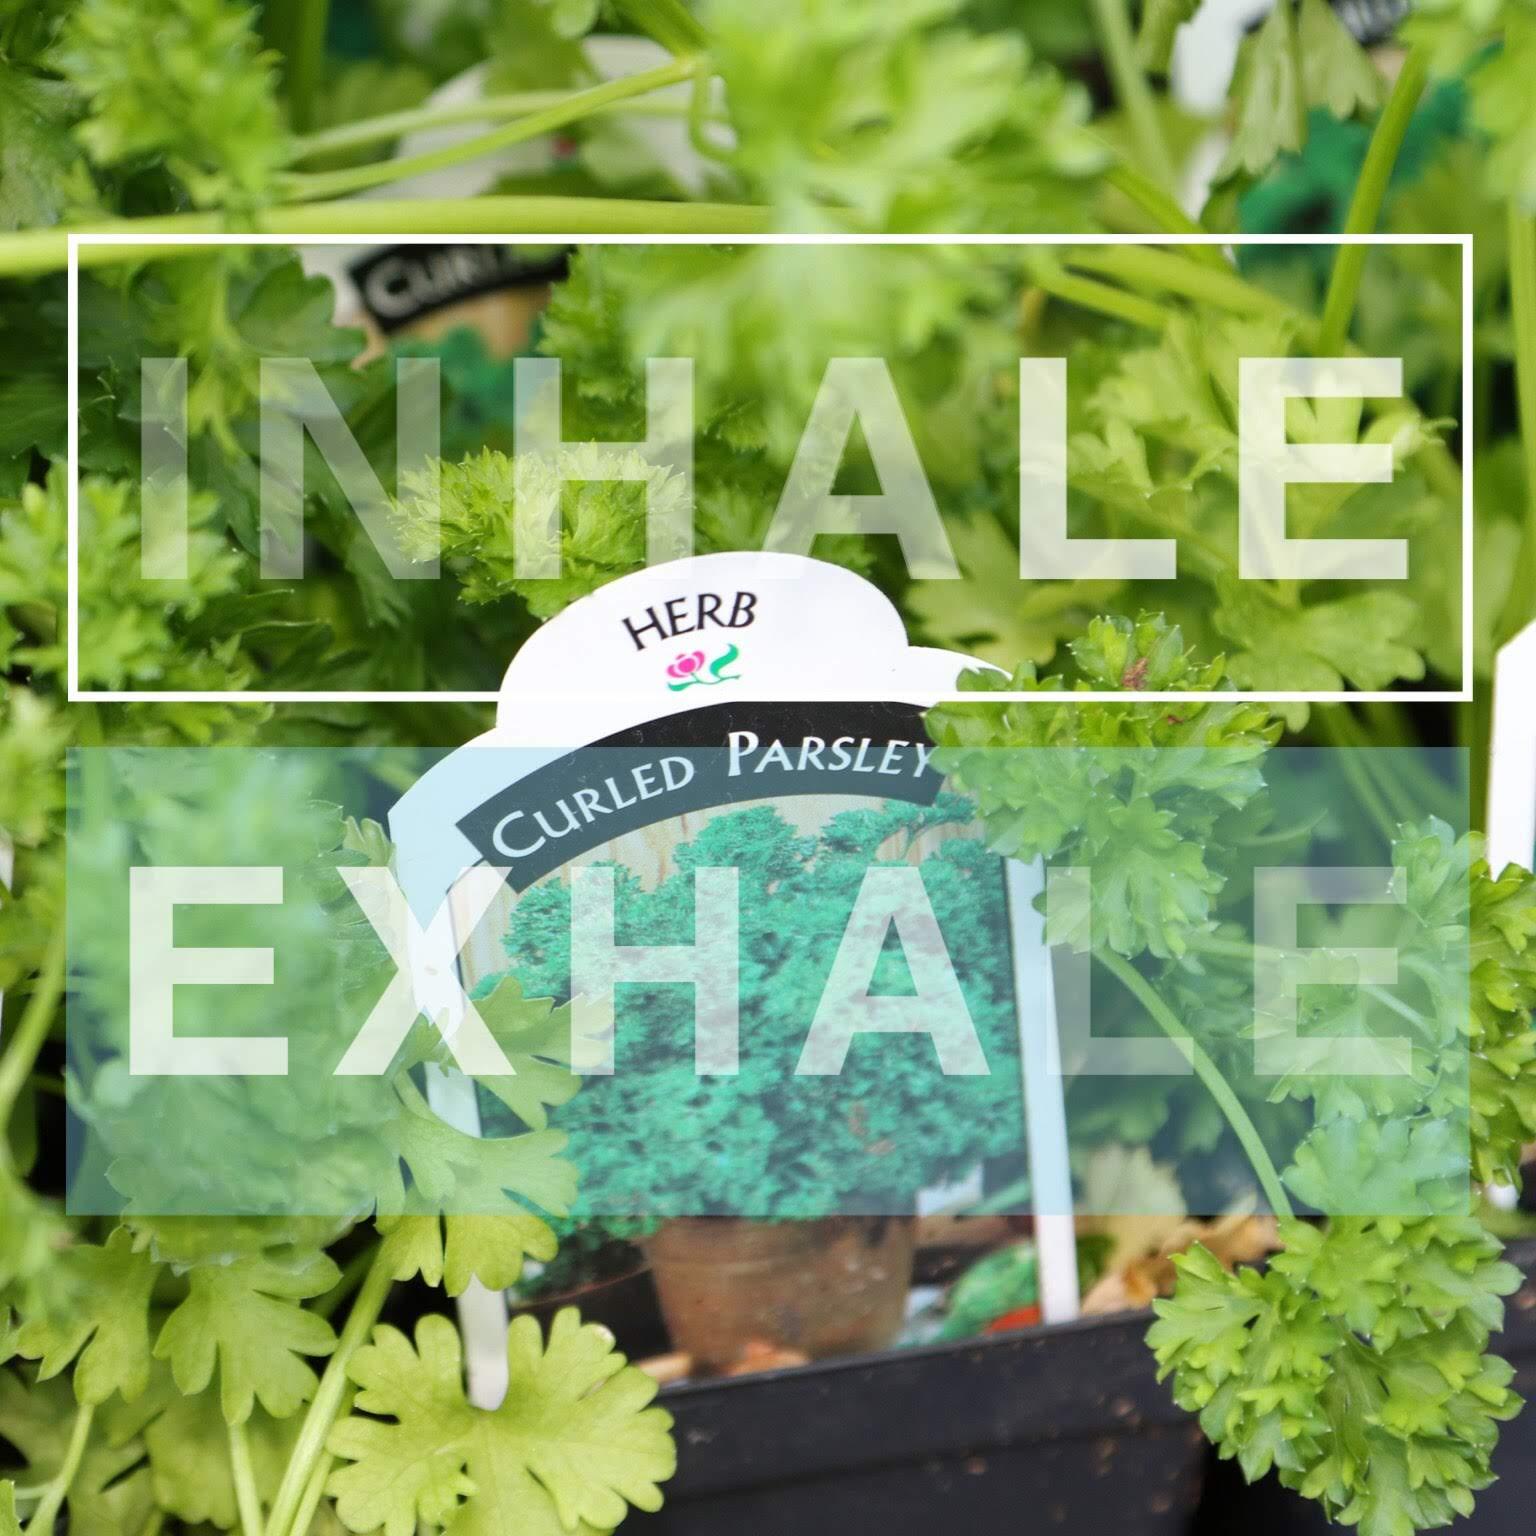 Herbs galore - basil, parsley, thyme, rosemary, cilantro, chives, tarragon